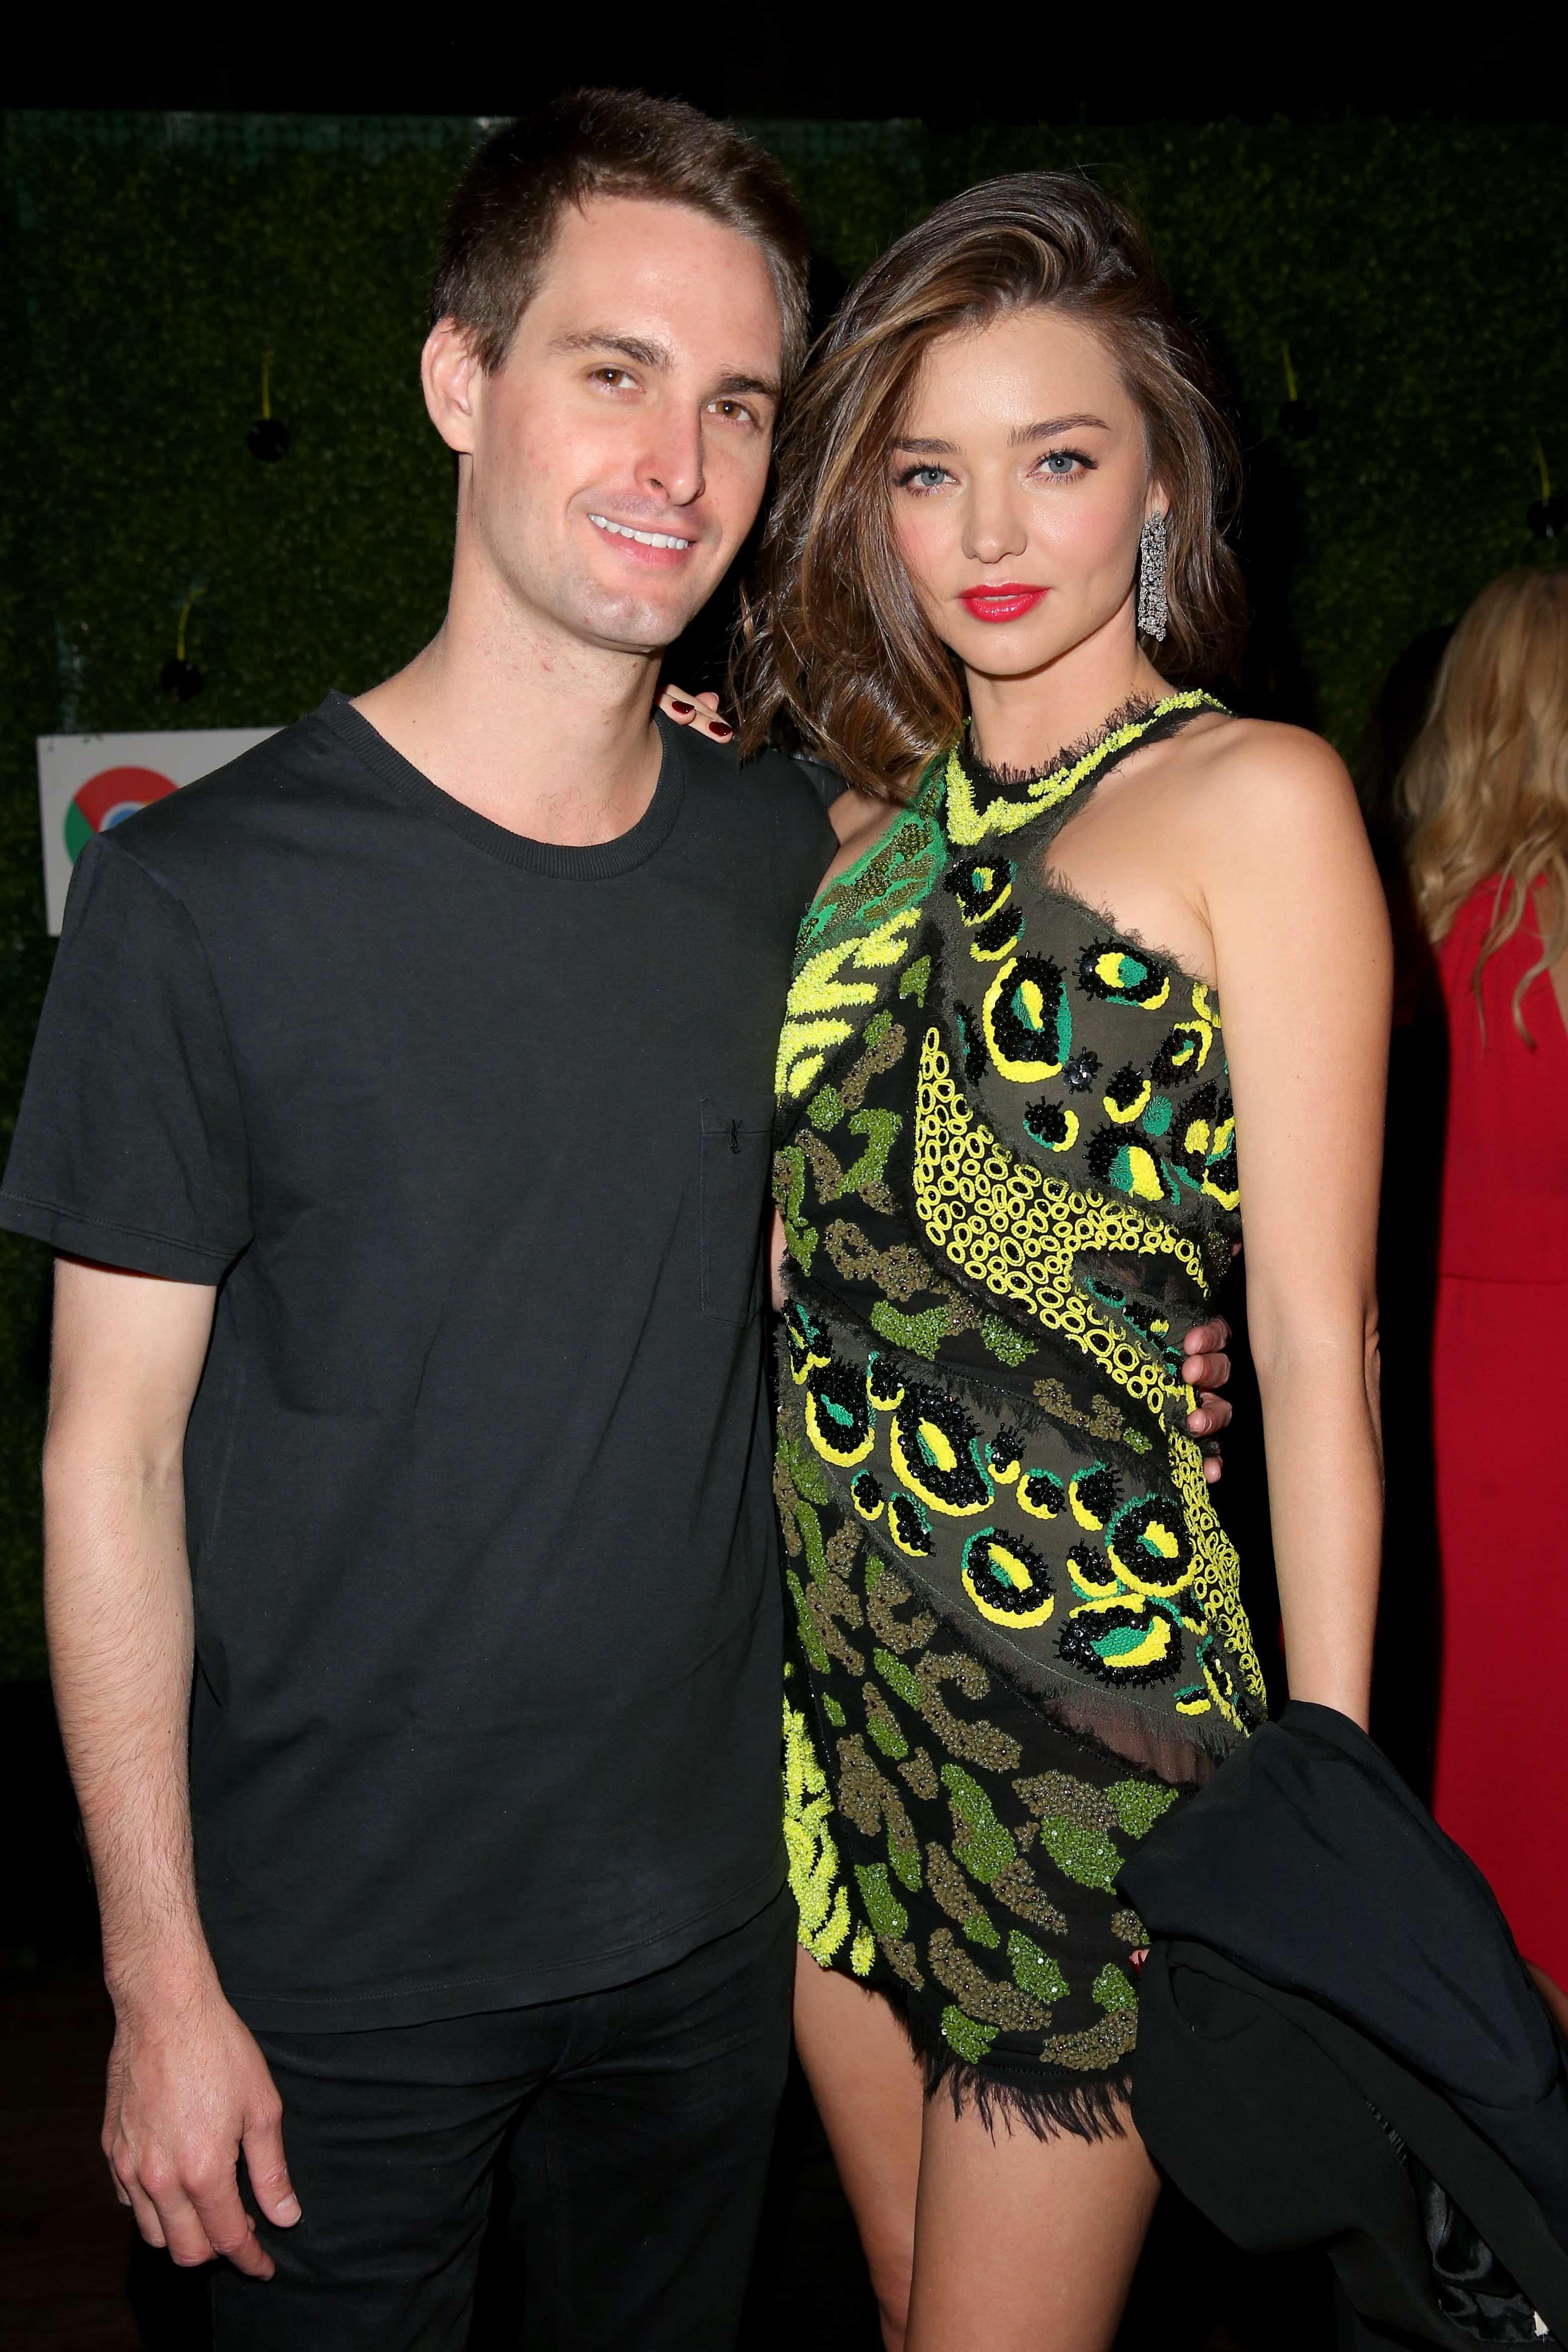 Evan Spiegel y la modelo Miranda Kerr